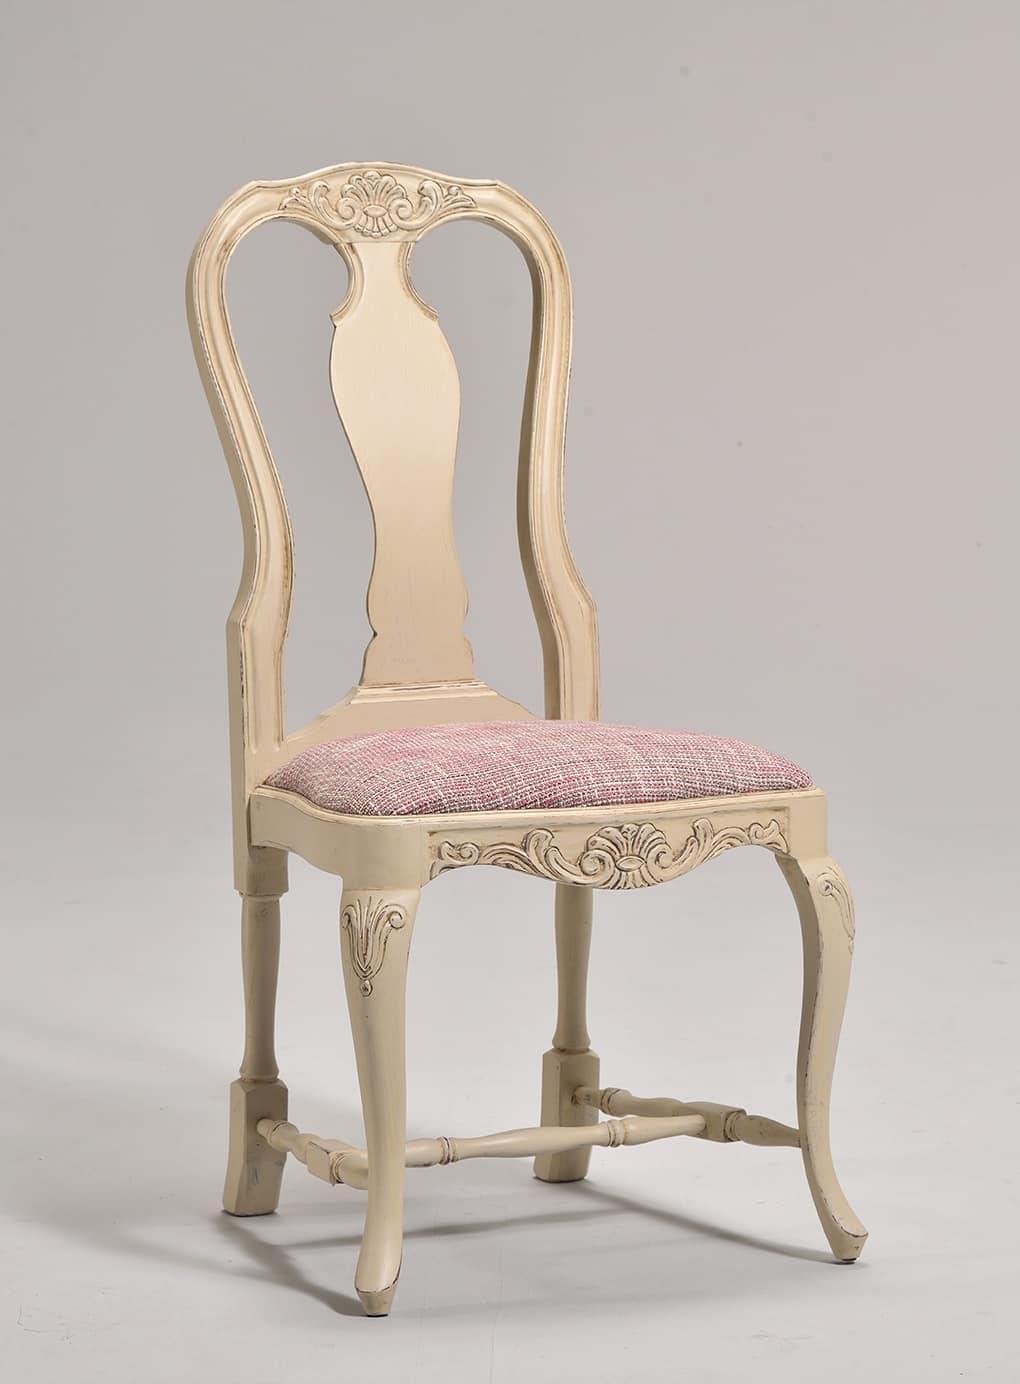 MALENE sedia 8124S, Sedia in stile gustaviano con seduta imbottita